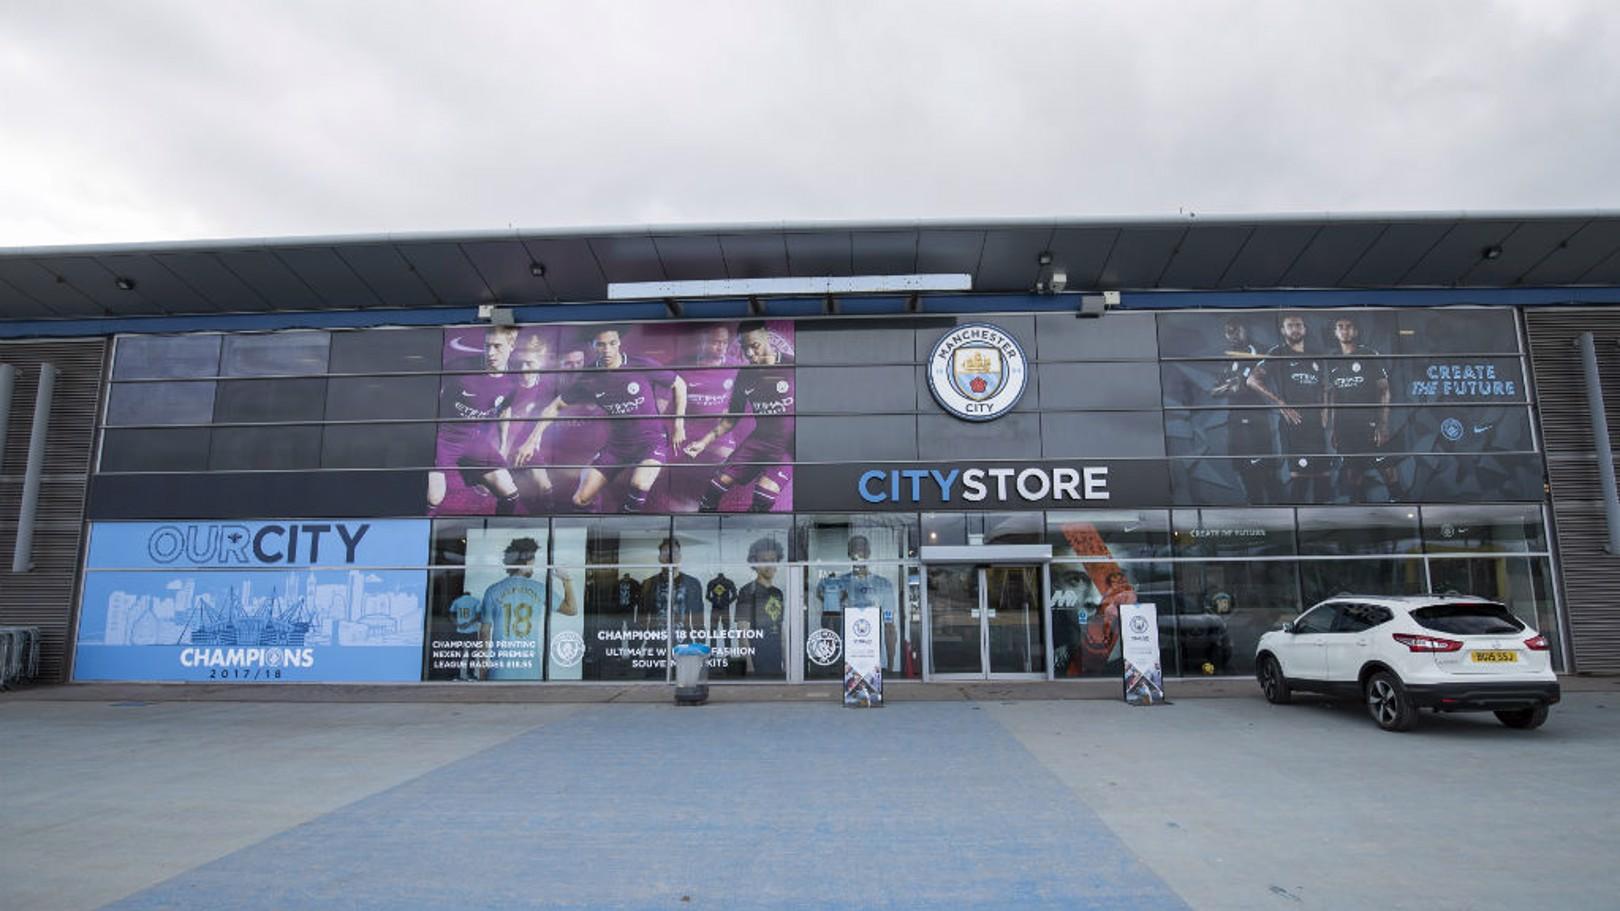 CLOSURE: The City store at the Etihad Stadium will shut for four weeks